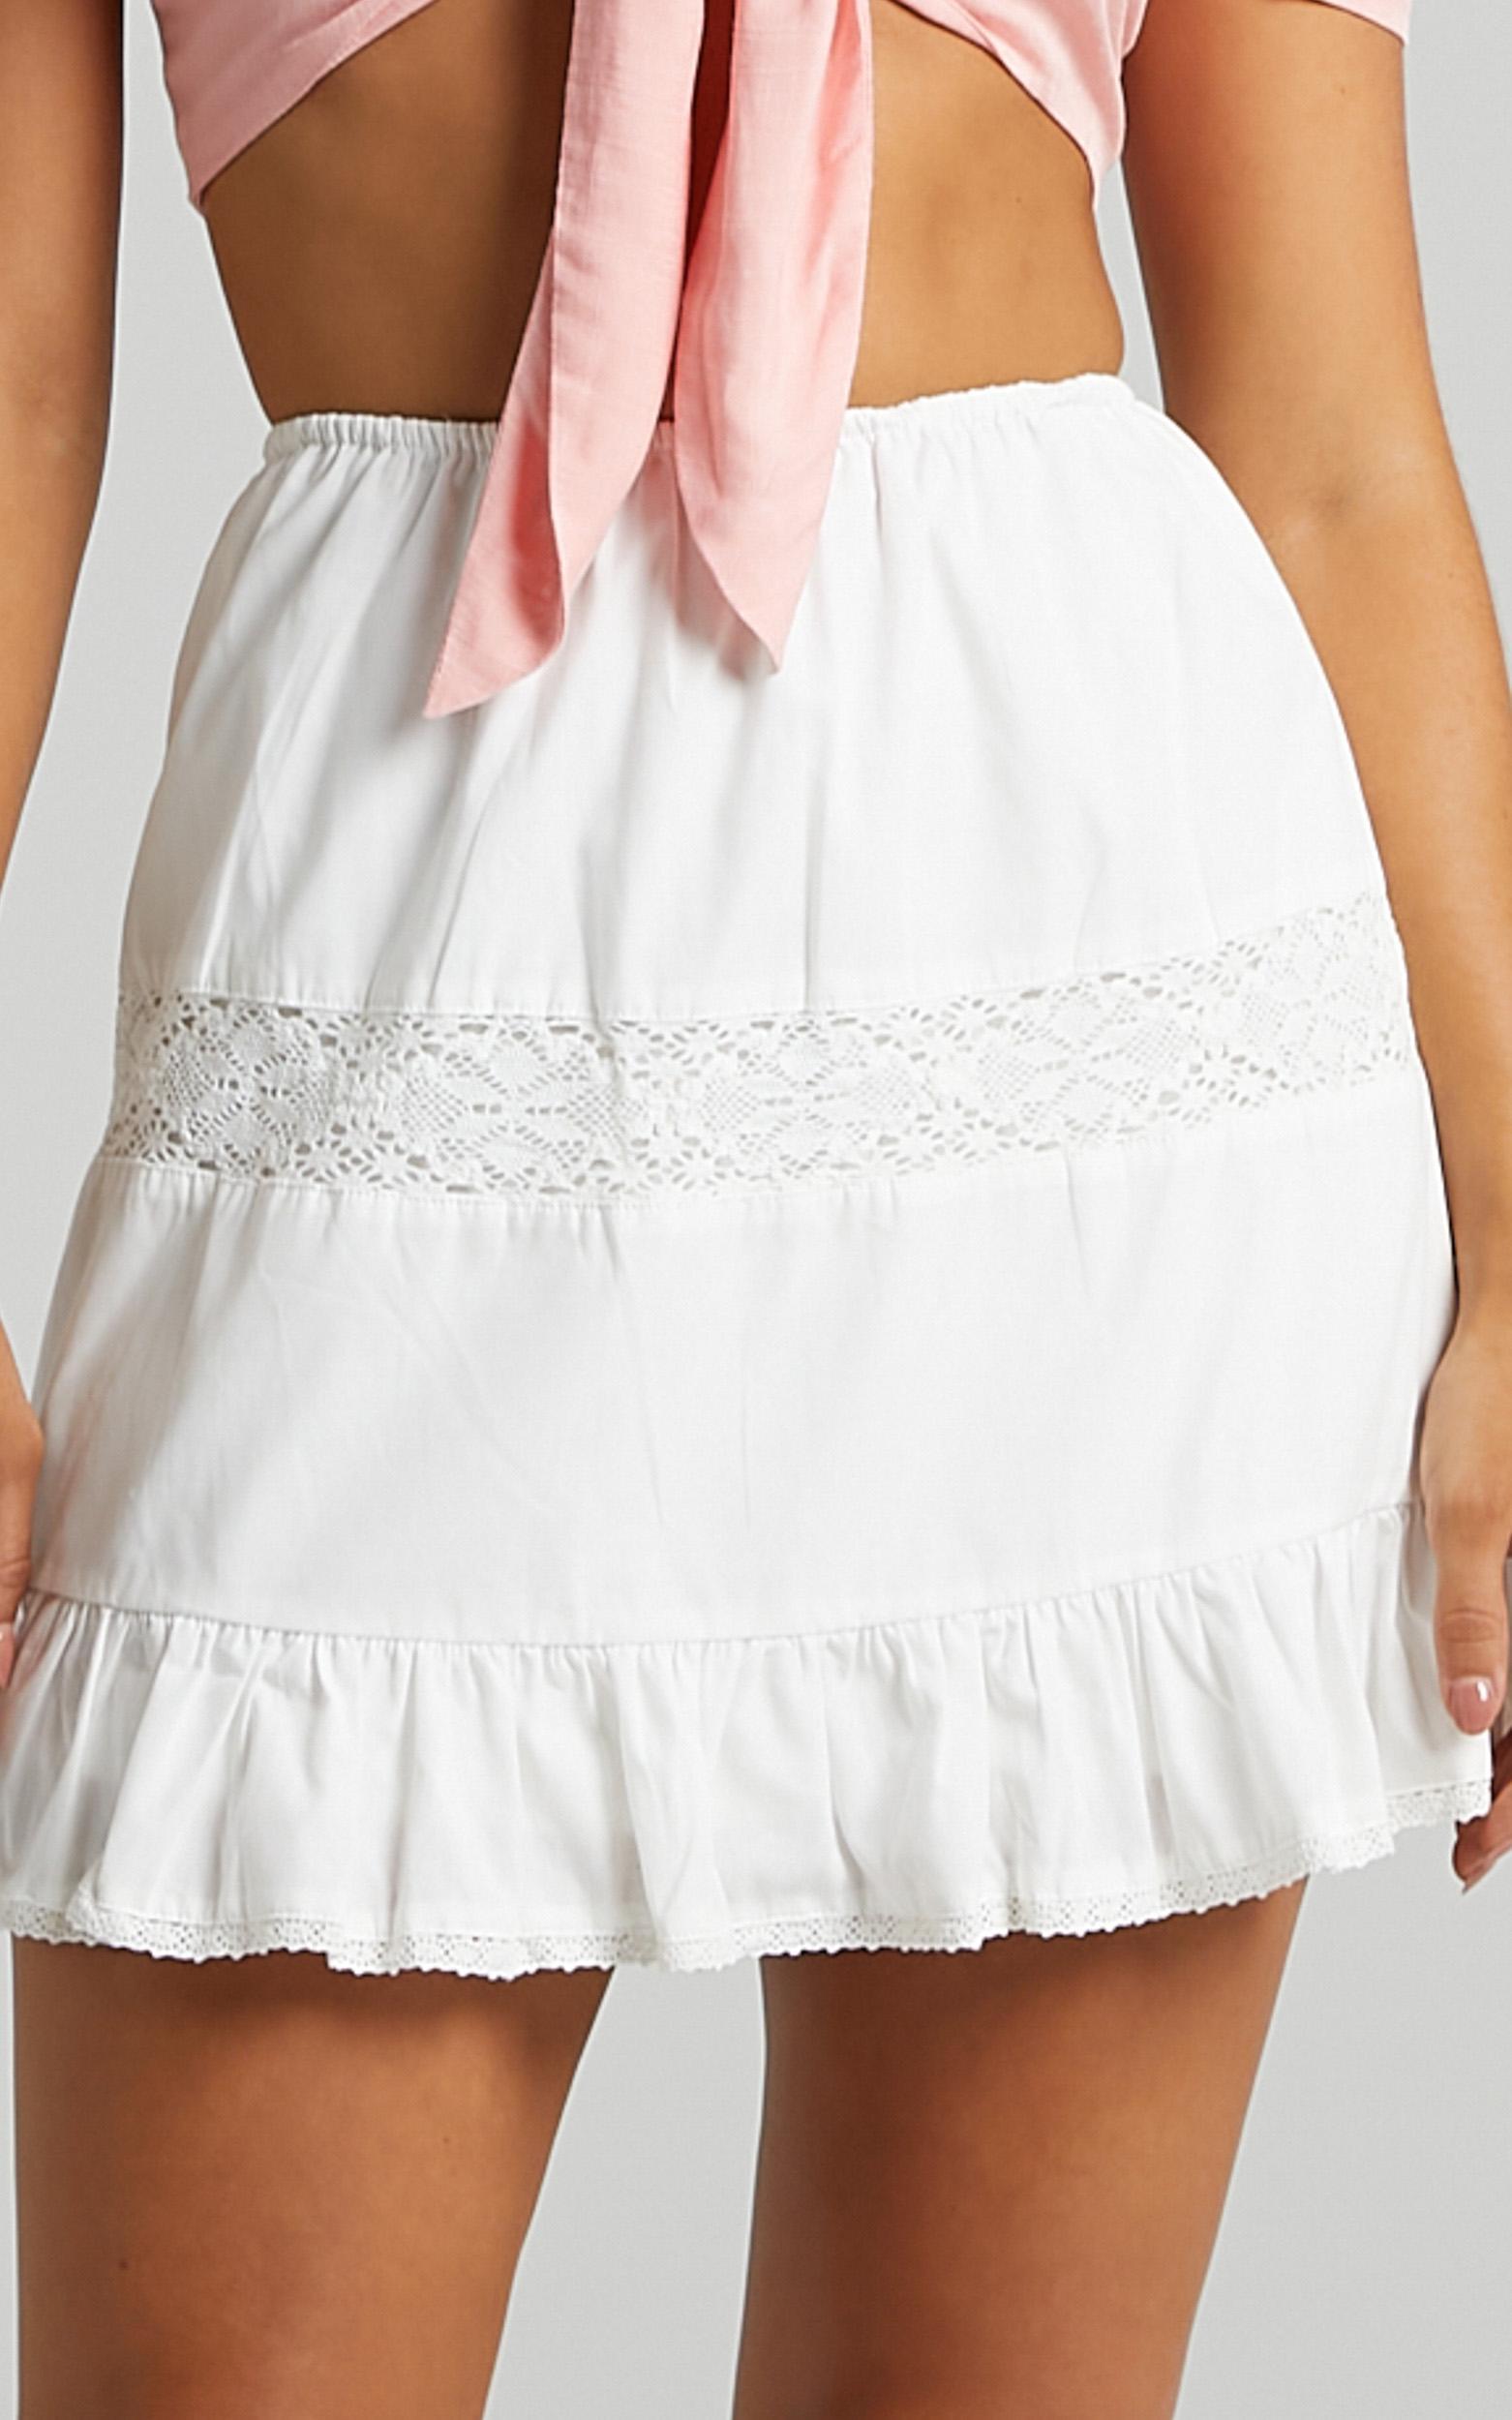 Zahra Skirt in White - 6 (XS), White, hi-res image number null